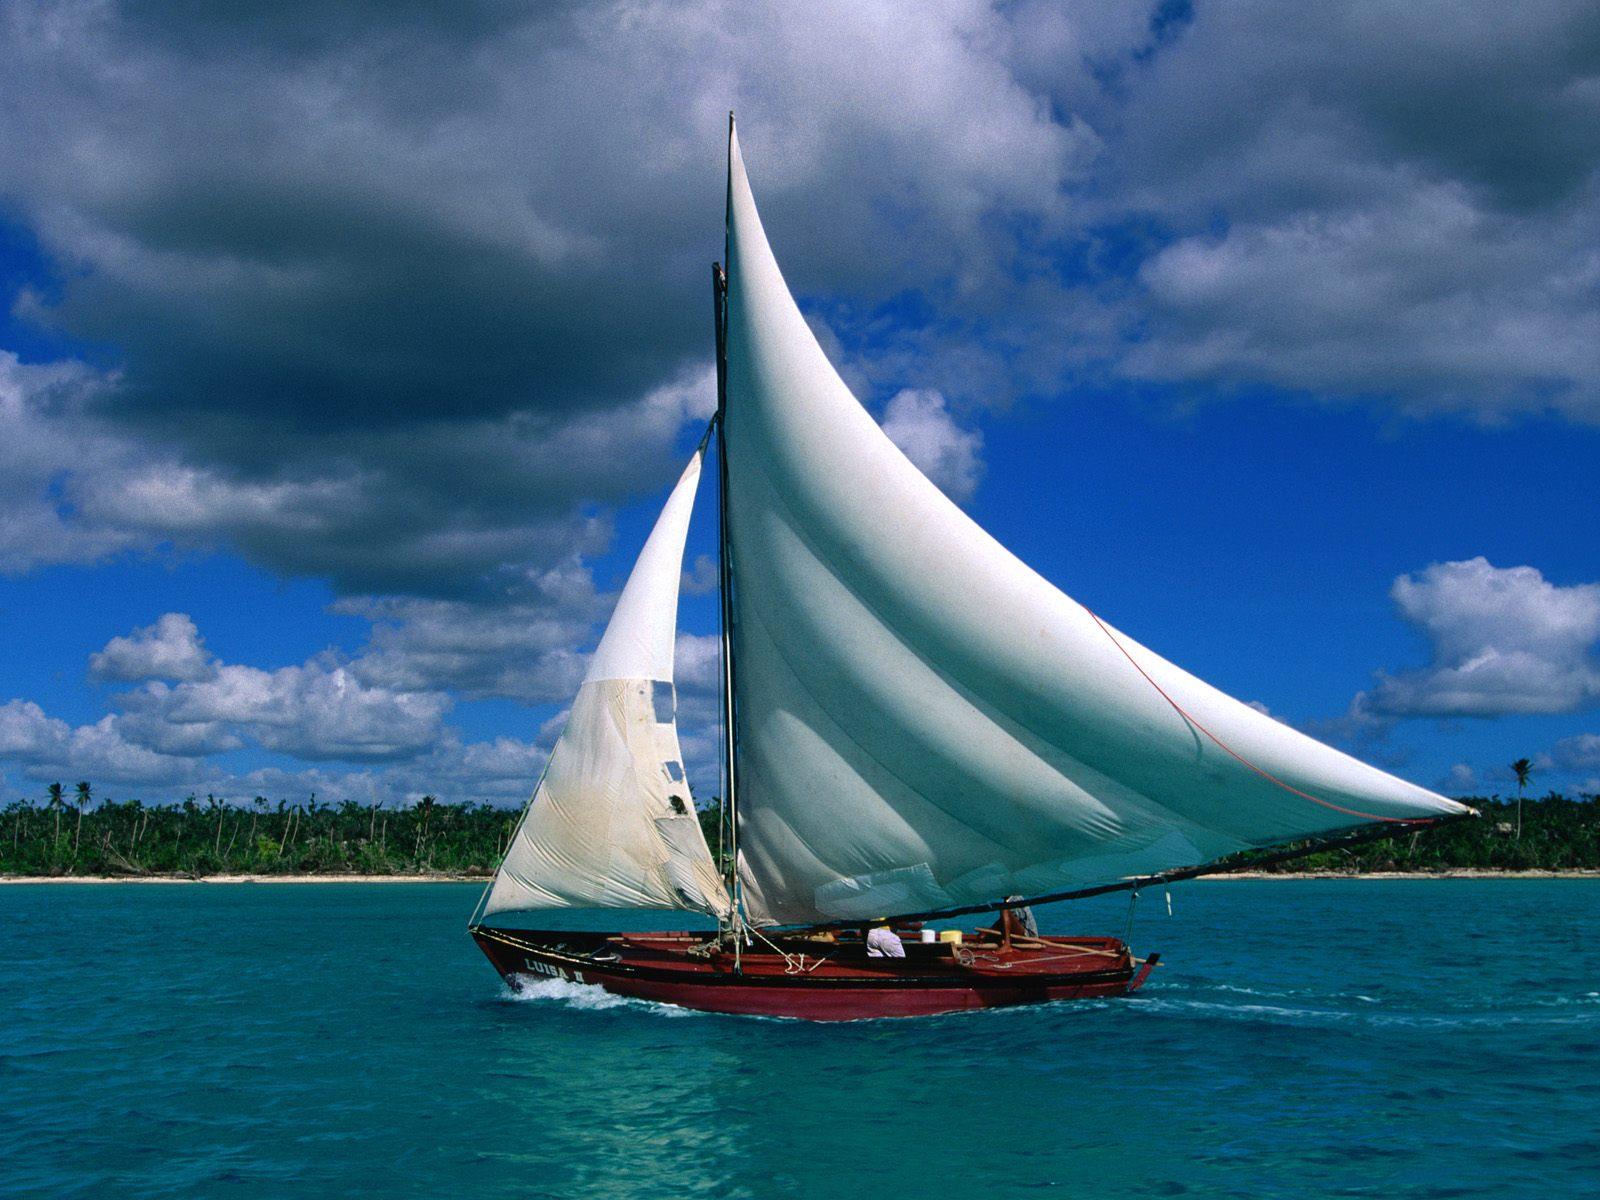 https://2.bp.blogspot.com/-HRVkY164vKk/Tv3ncW4KrfI/AAAAAAAADZI/Xo4Vhz461yg/s1600/Fishing+Sailboat%252C+Bayahibe%252C+La+Romana%252C+Dominican+Republic.jpg